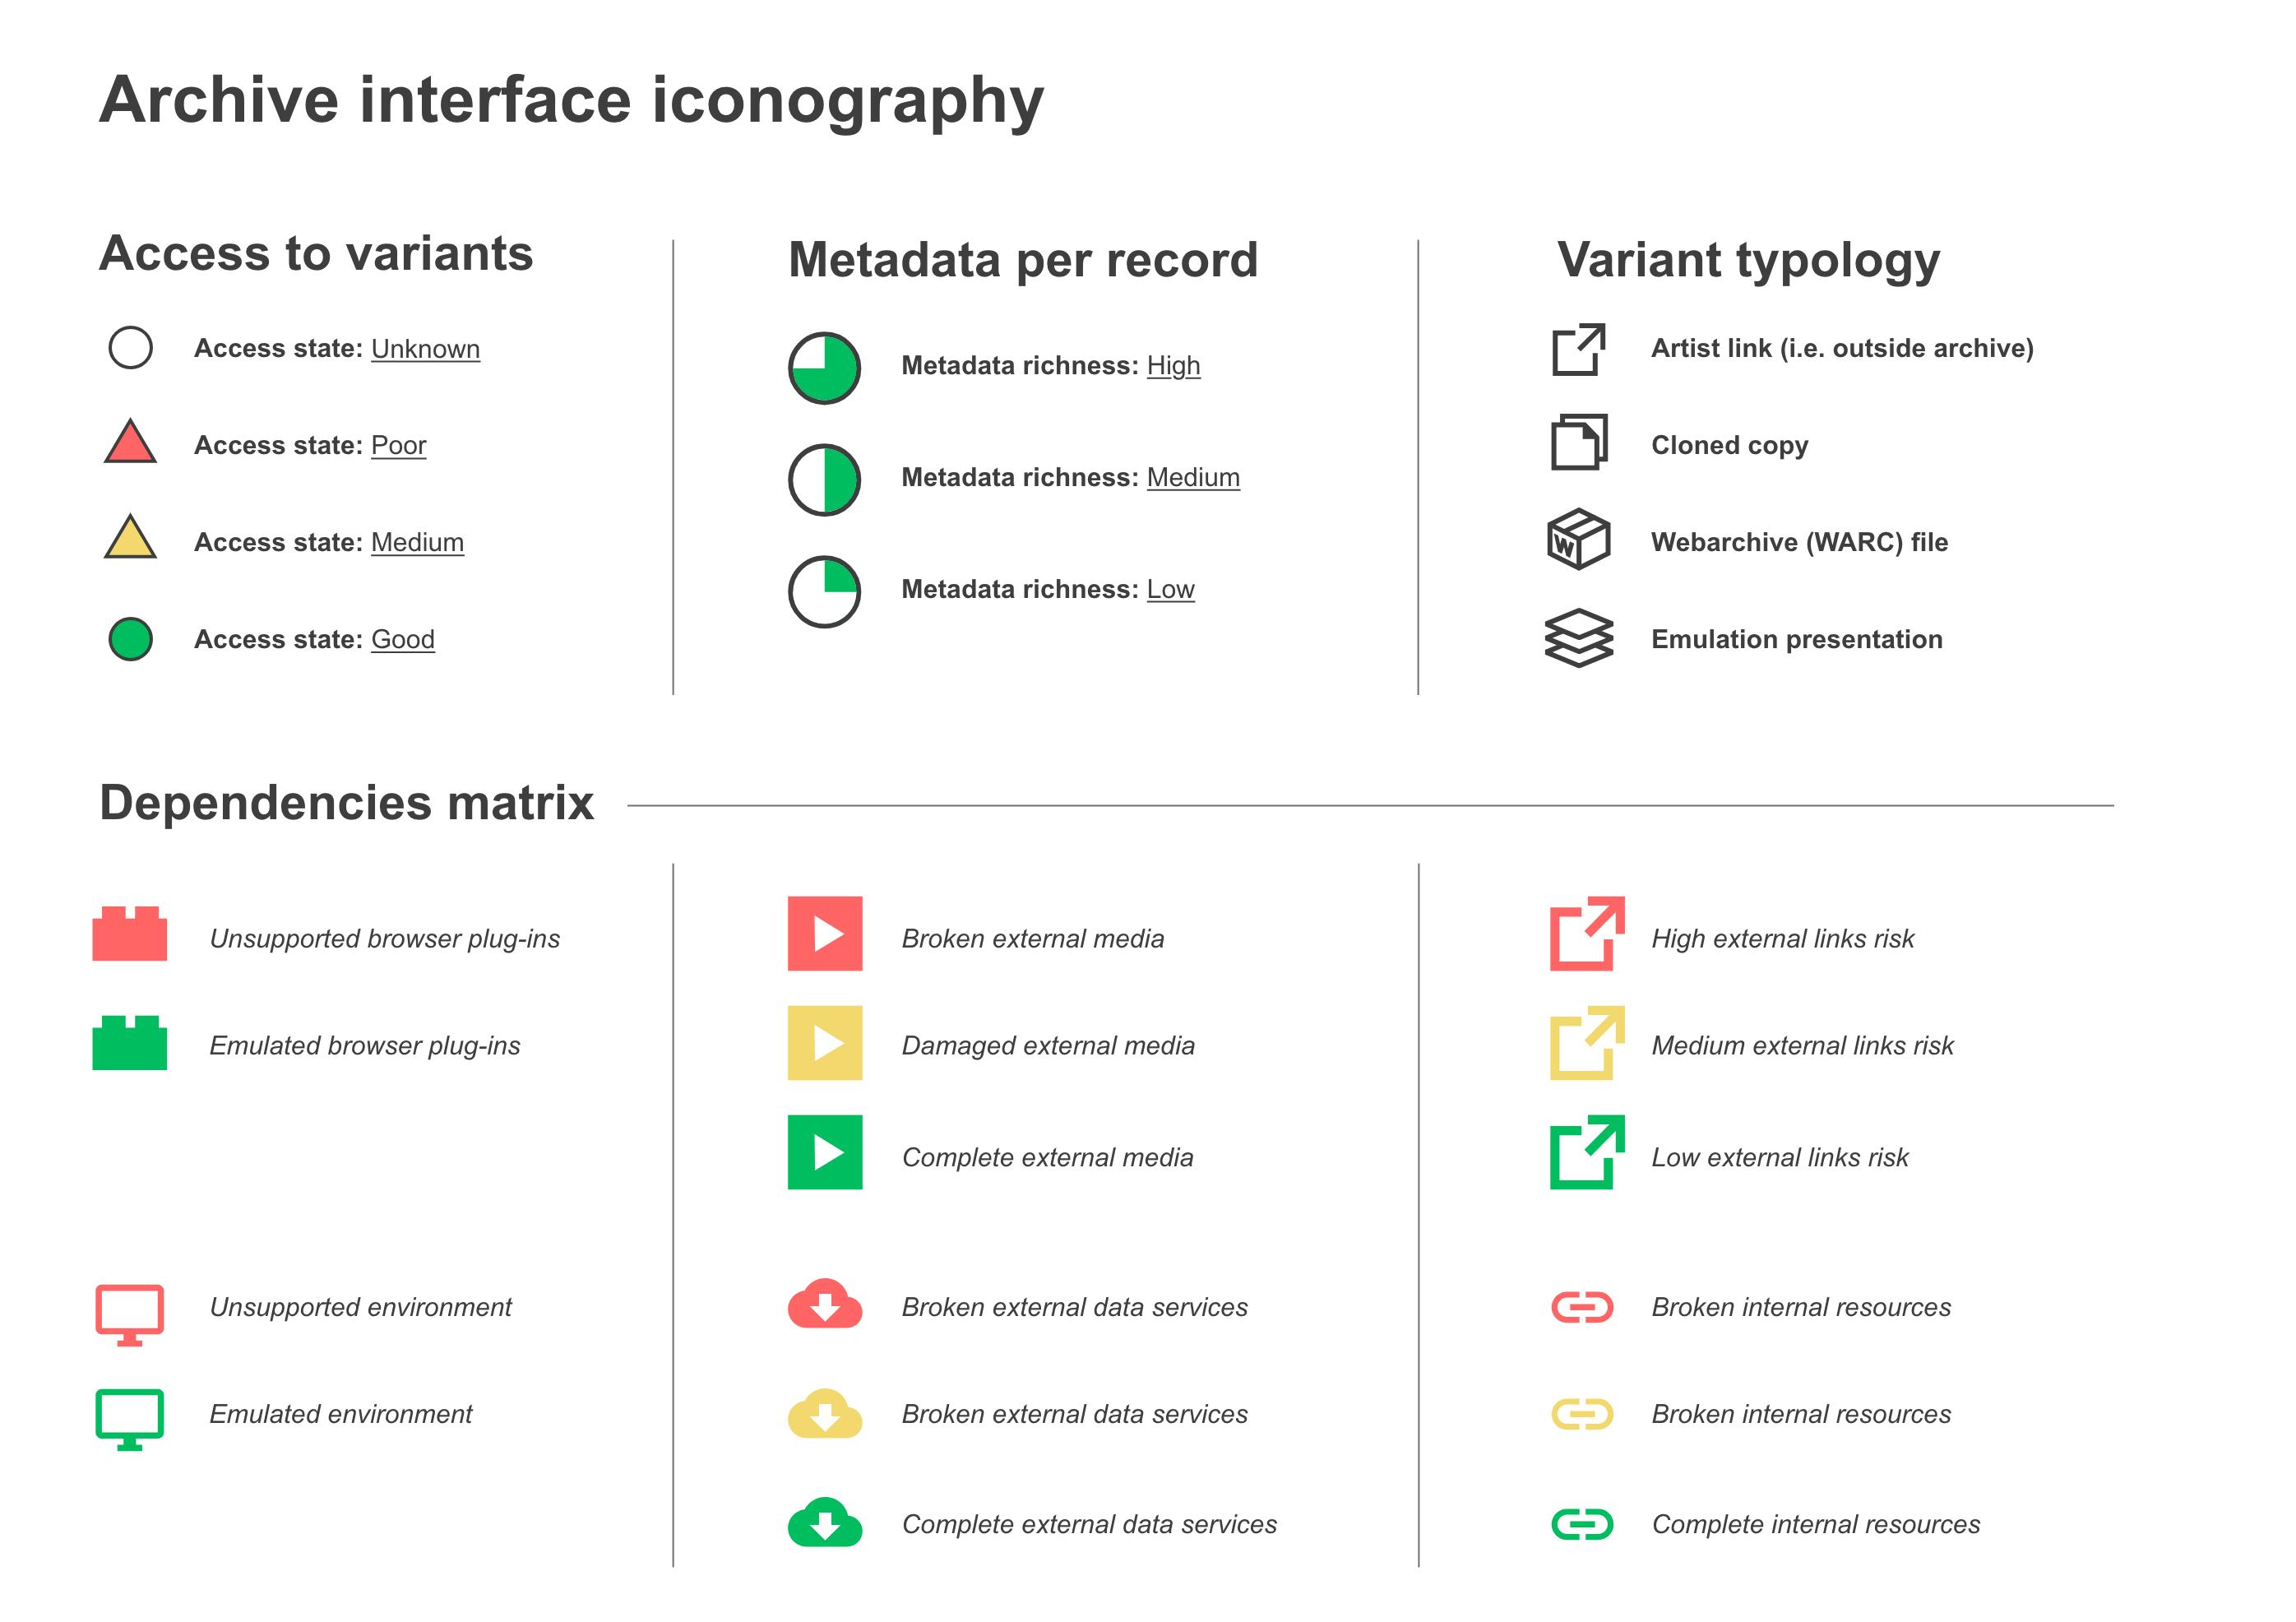 ArtBase_prototype_iconography